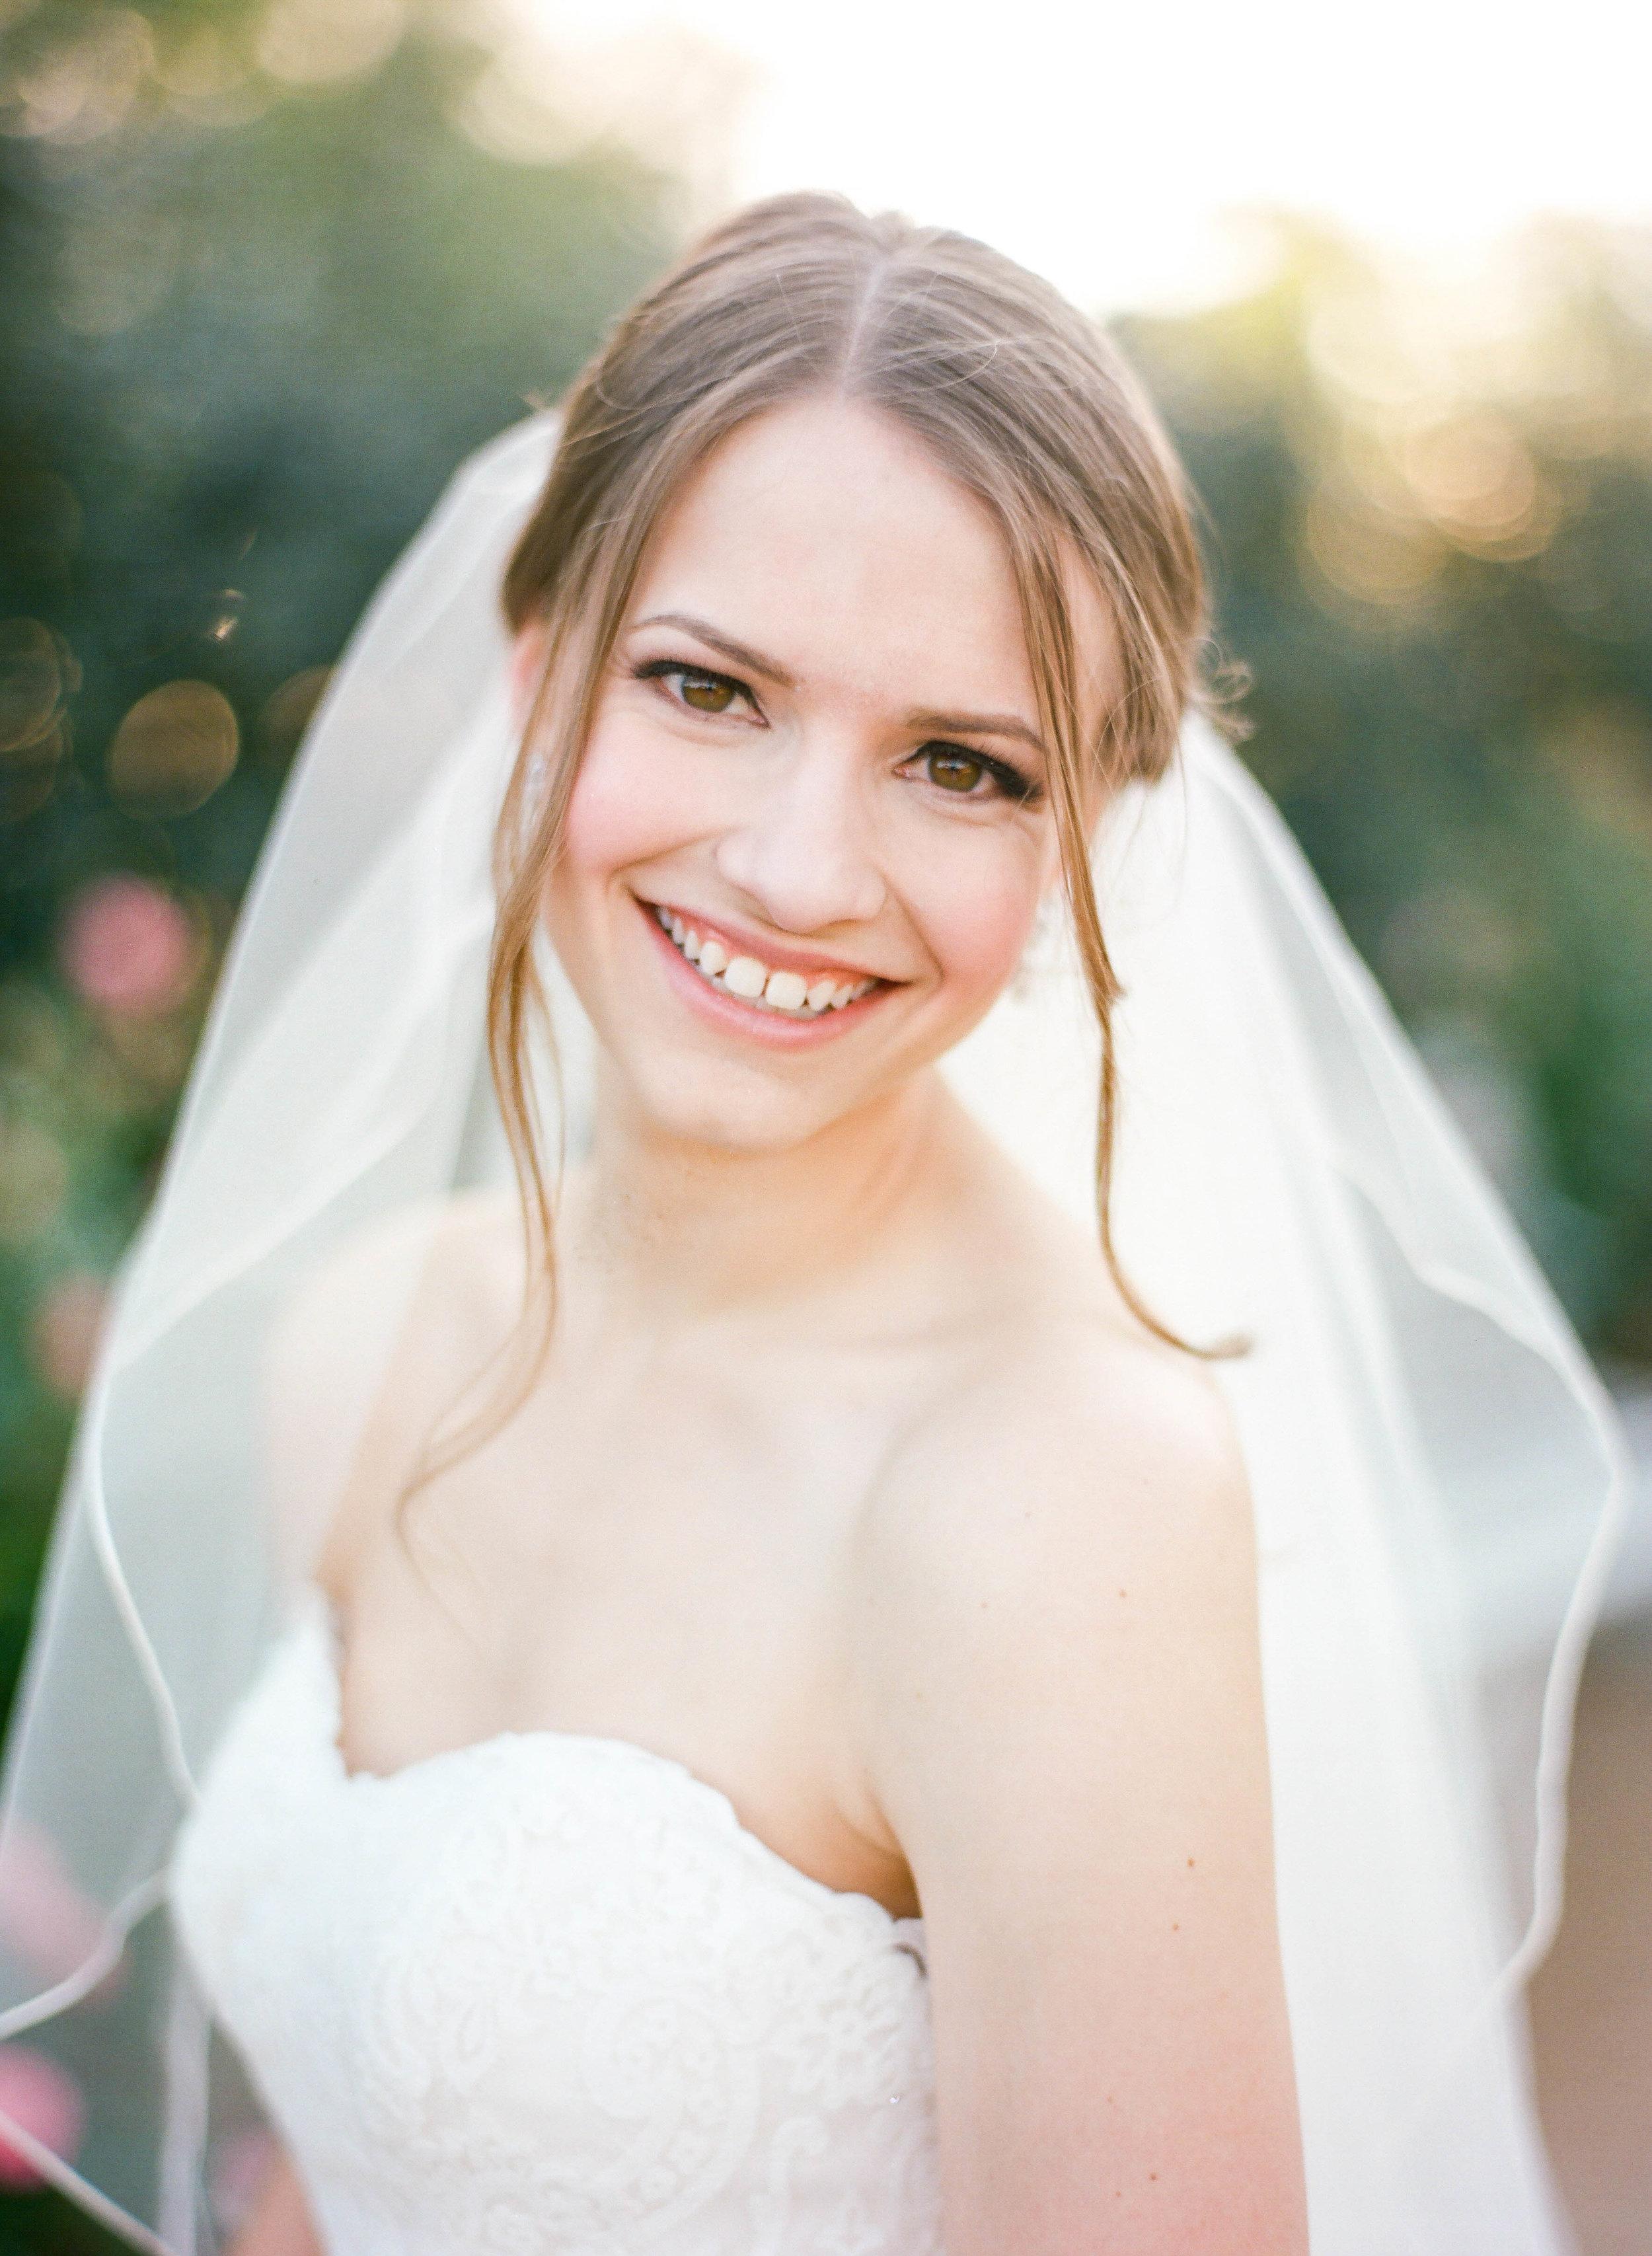 Houston-Wedding-Photographer-Film-Fine-Art-Bridals-Dana Fernandez-Photography-12.jpg